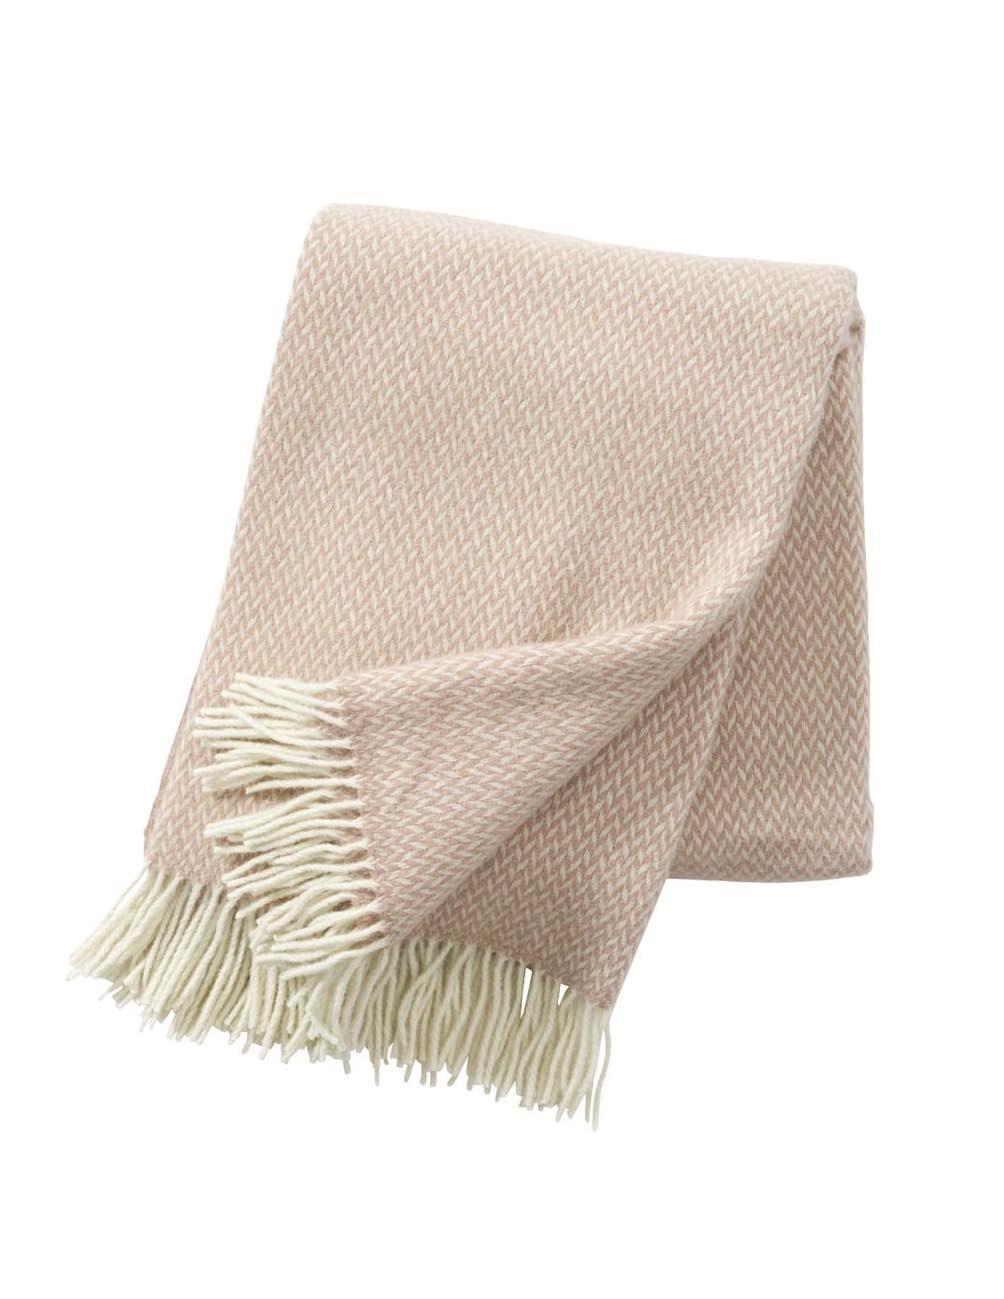 Pulse Nude Blanket/Throw